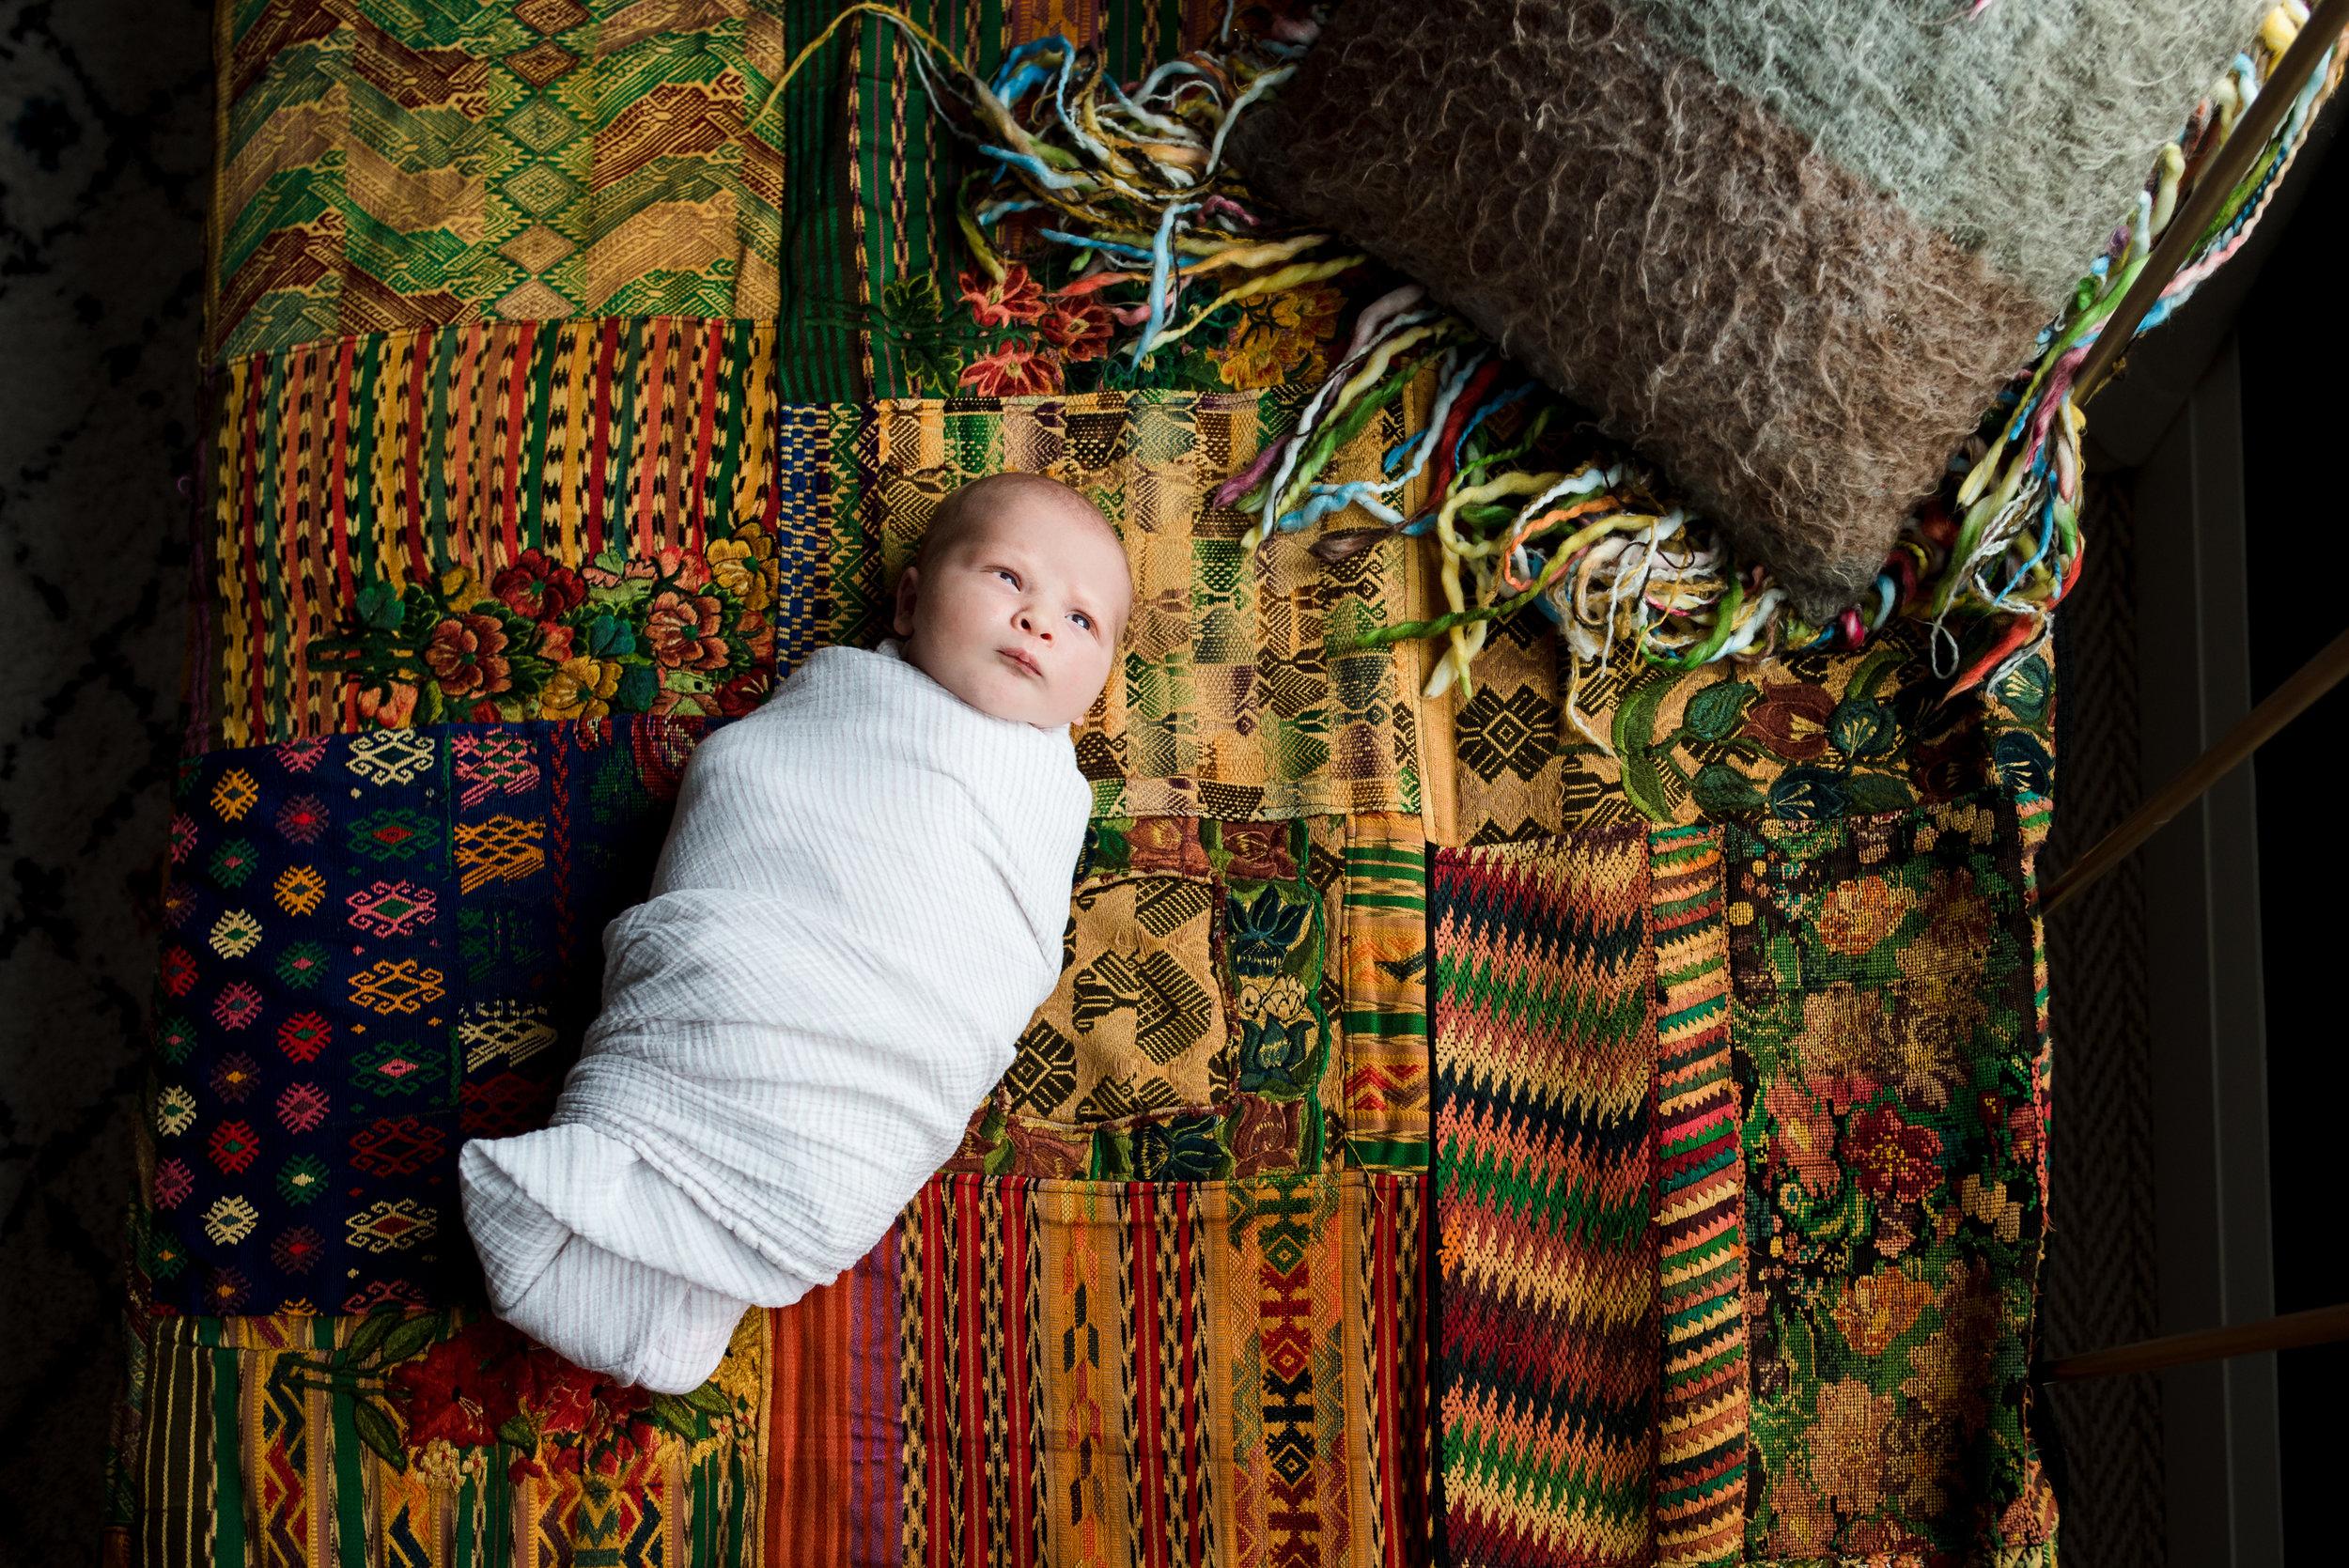 Colourfun newborn image by Unscripted mentor Kelly Marleau.jpg